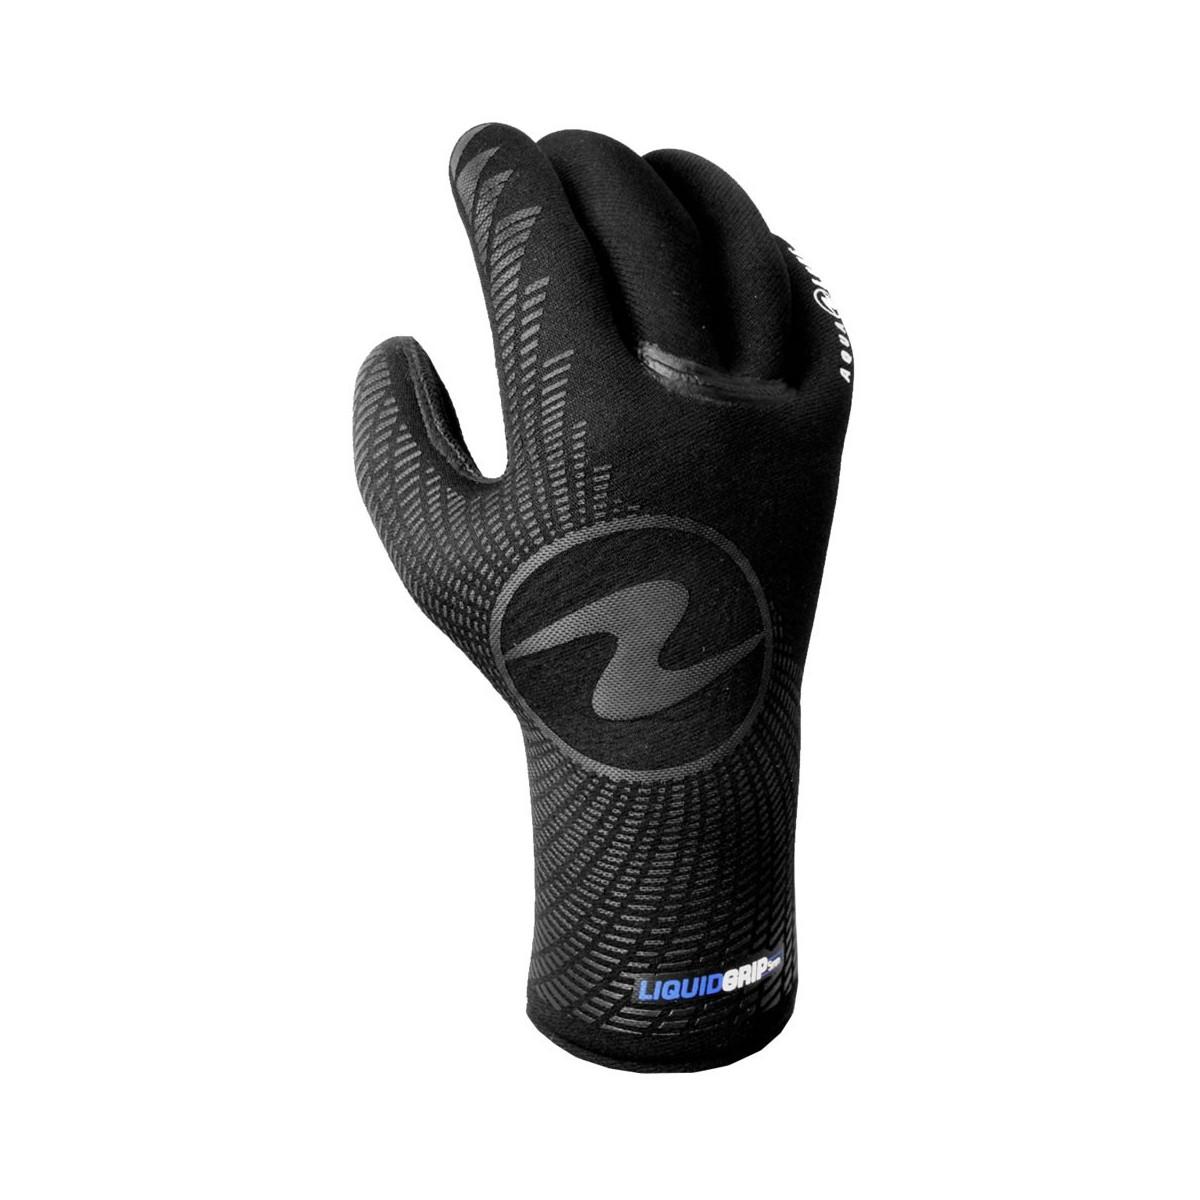 Aqua Lung Liquid Grip Gloves 5mm